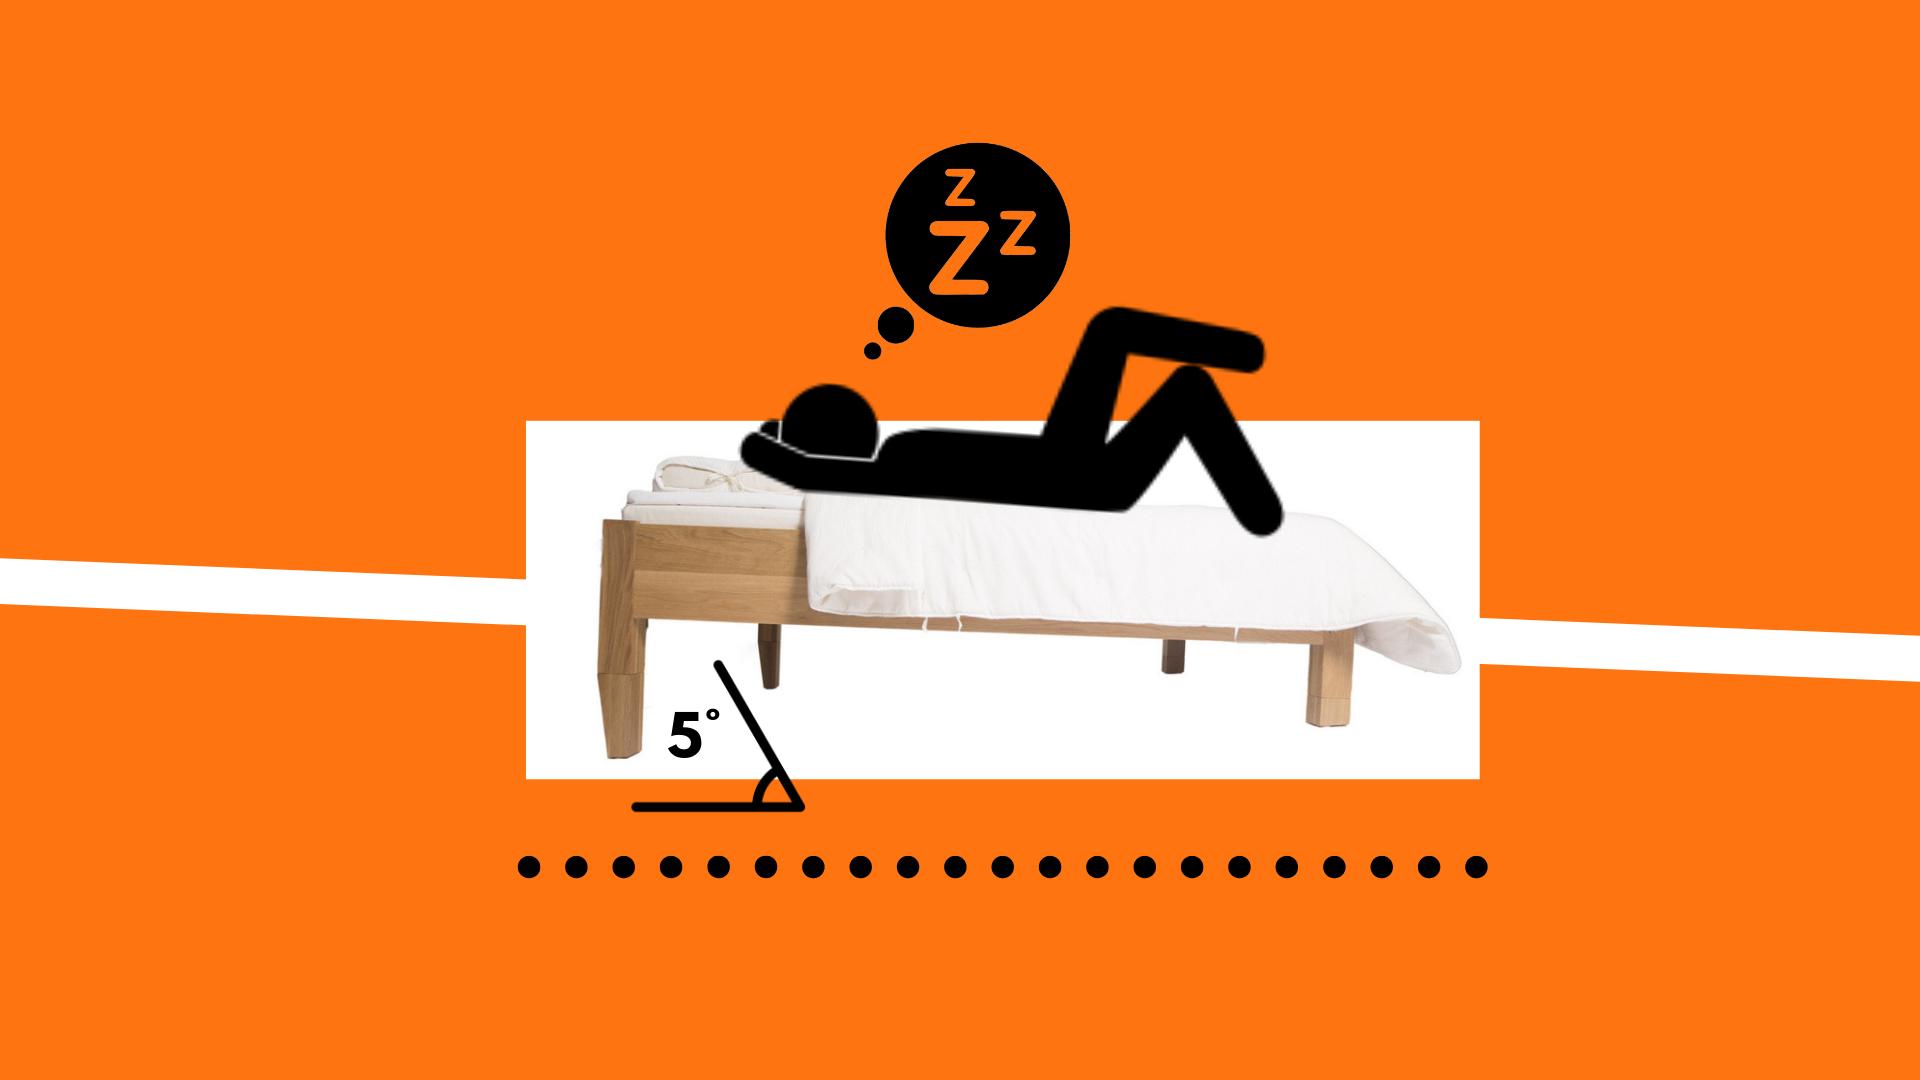 Sleephack Ultra Głęboki Sen A Terapia Pochylonego łóżka